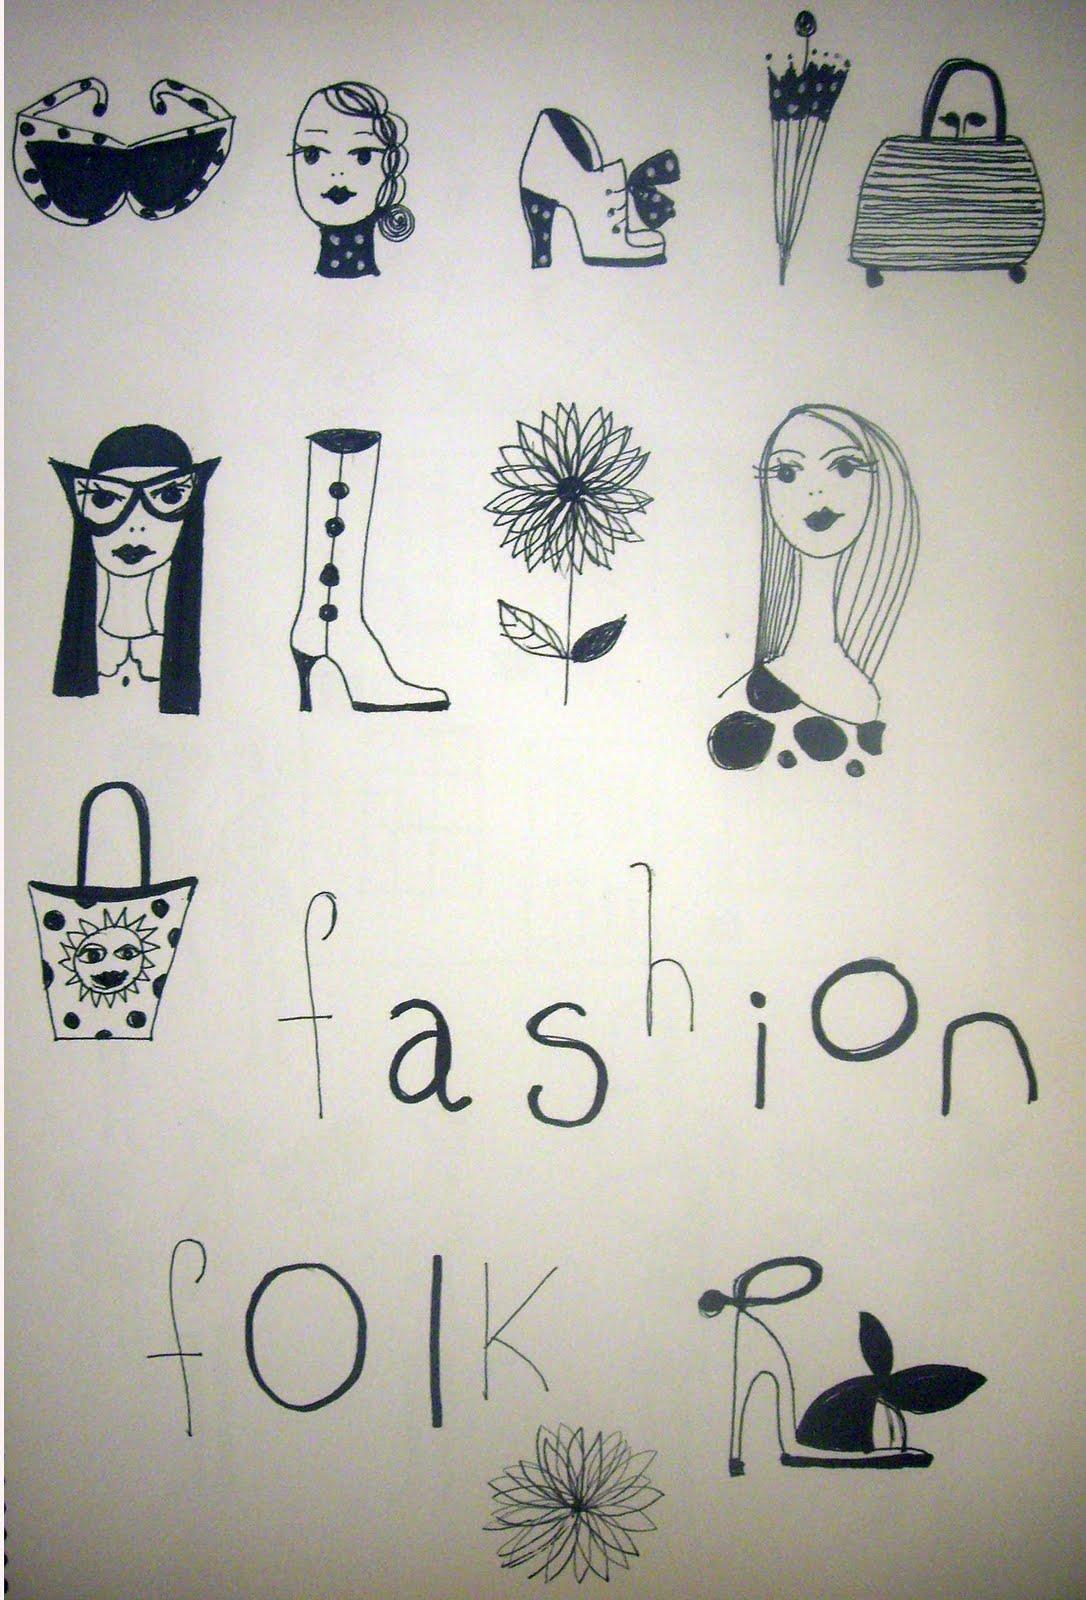 http://4.bp.blogspot.com/_LbmYm9ULcY8/TQ6HsXgysdI/AAAAAAAACNk/43pgs-KaoAY/s1600/fashion%2Bfolk.jpg